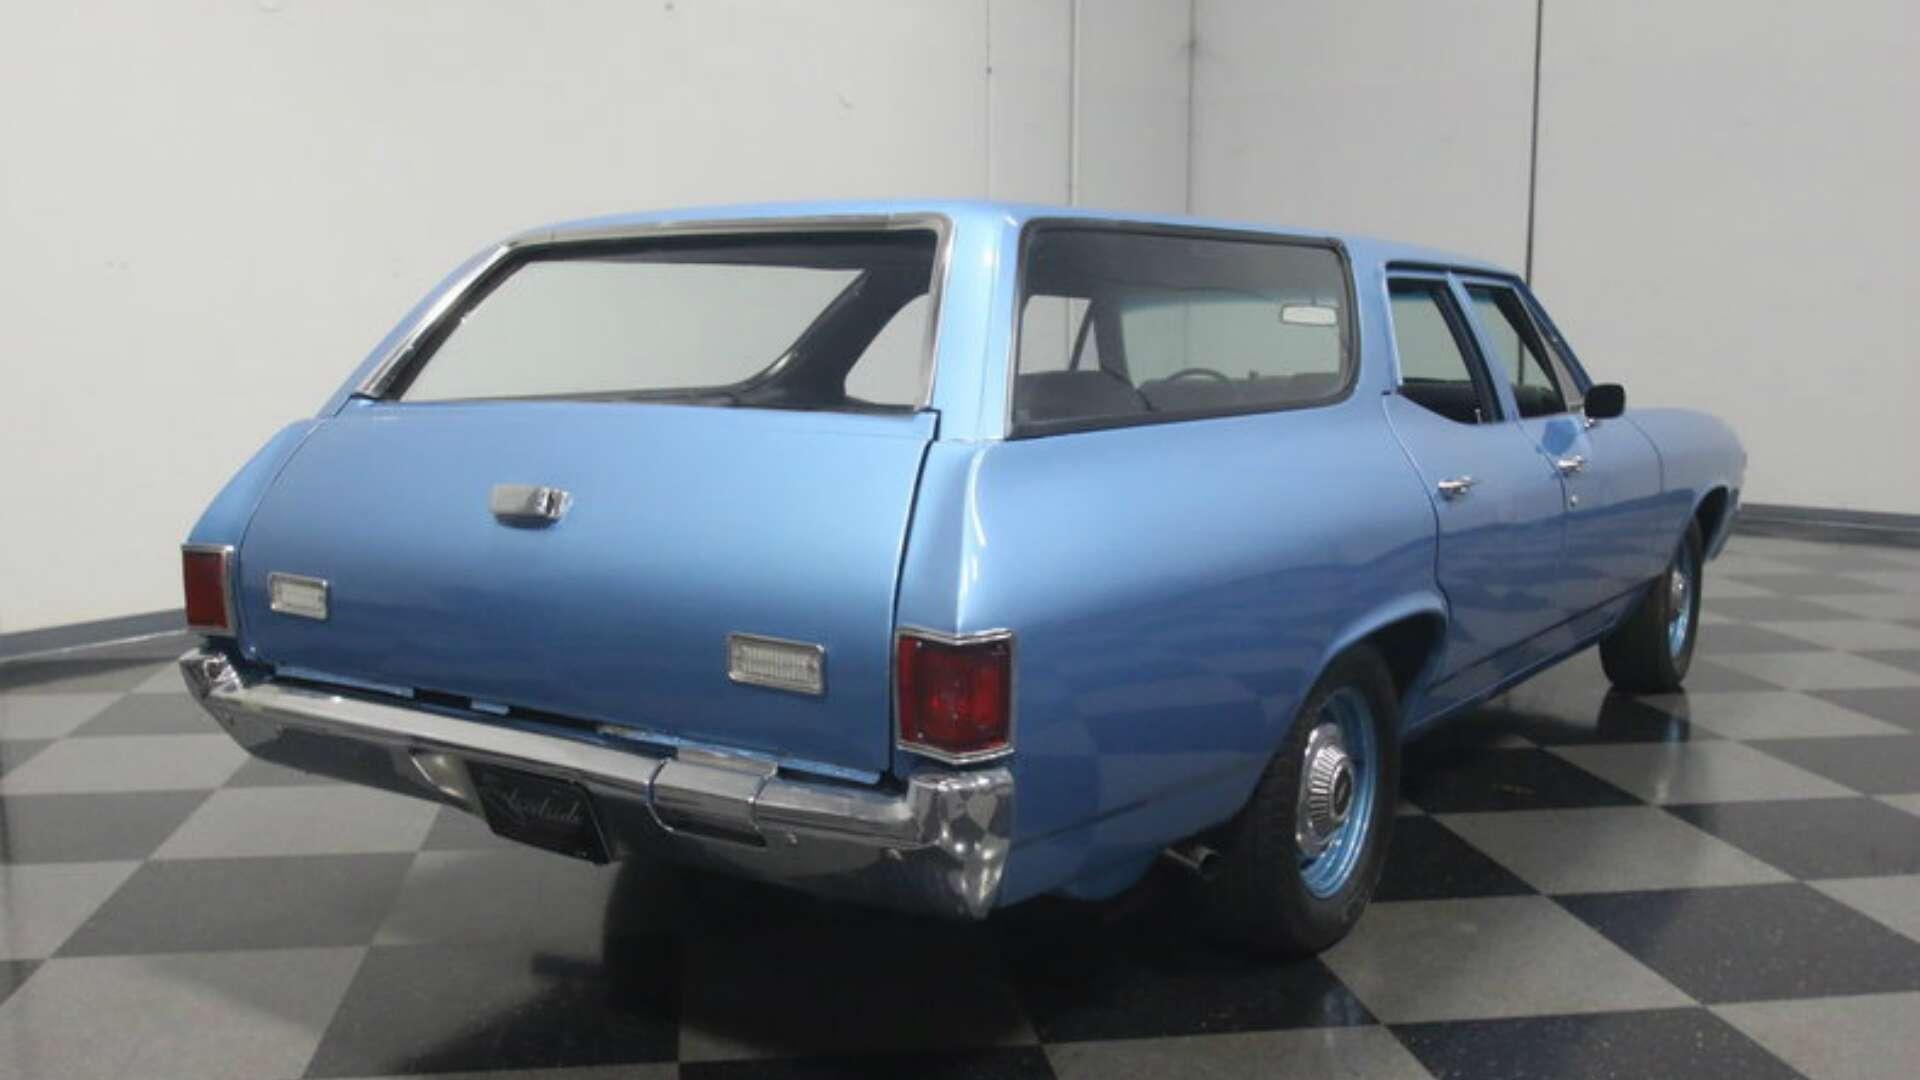 Modified Chevelle Wagon For Sale - The Drive